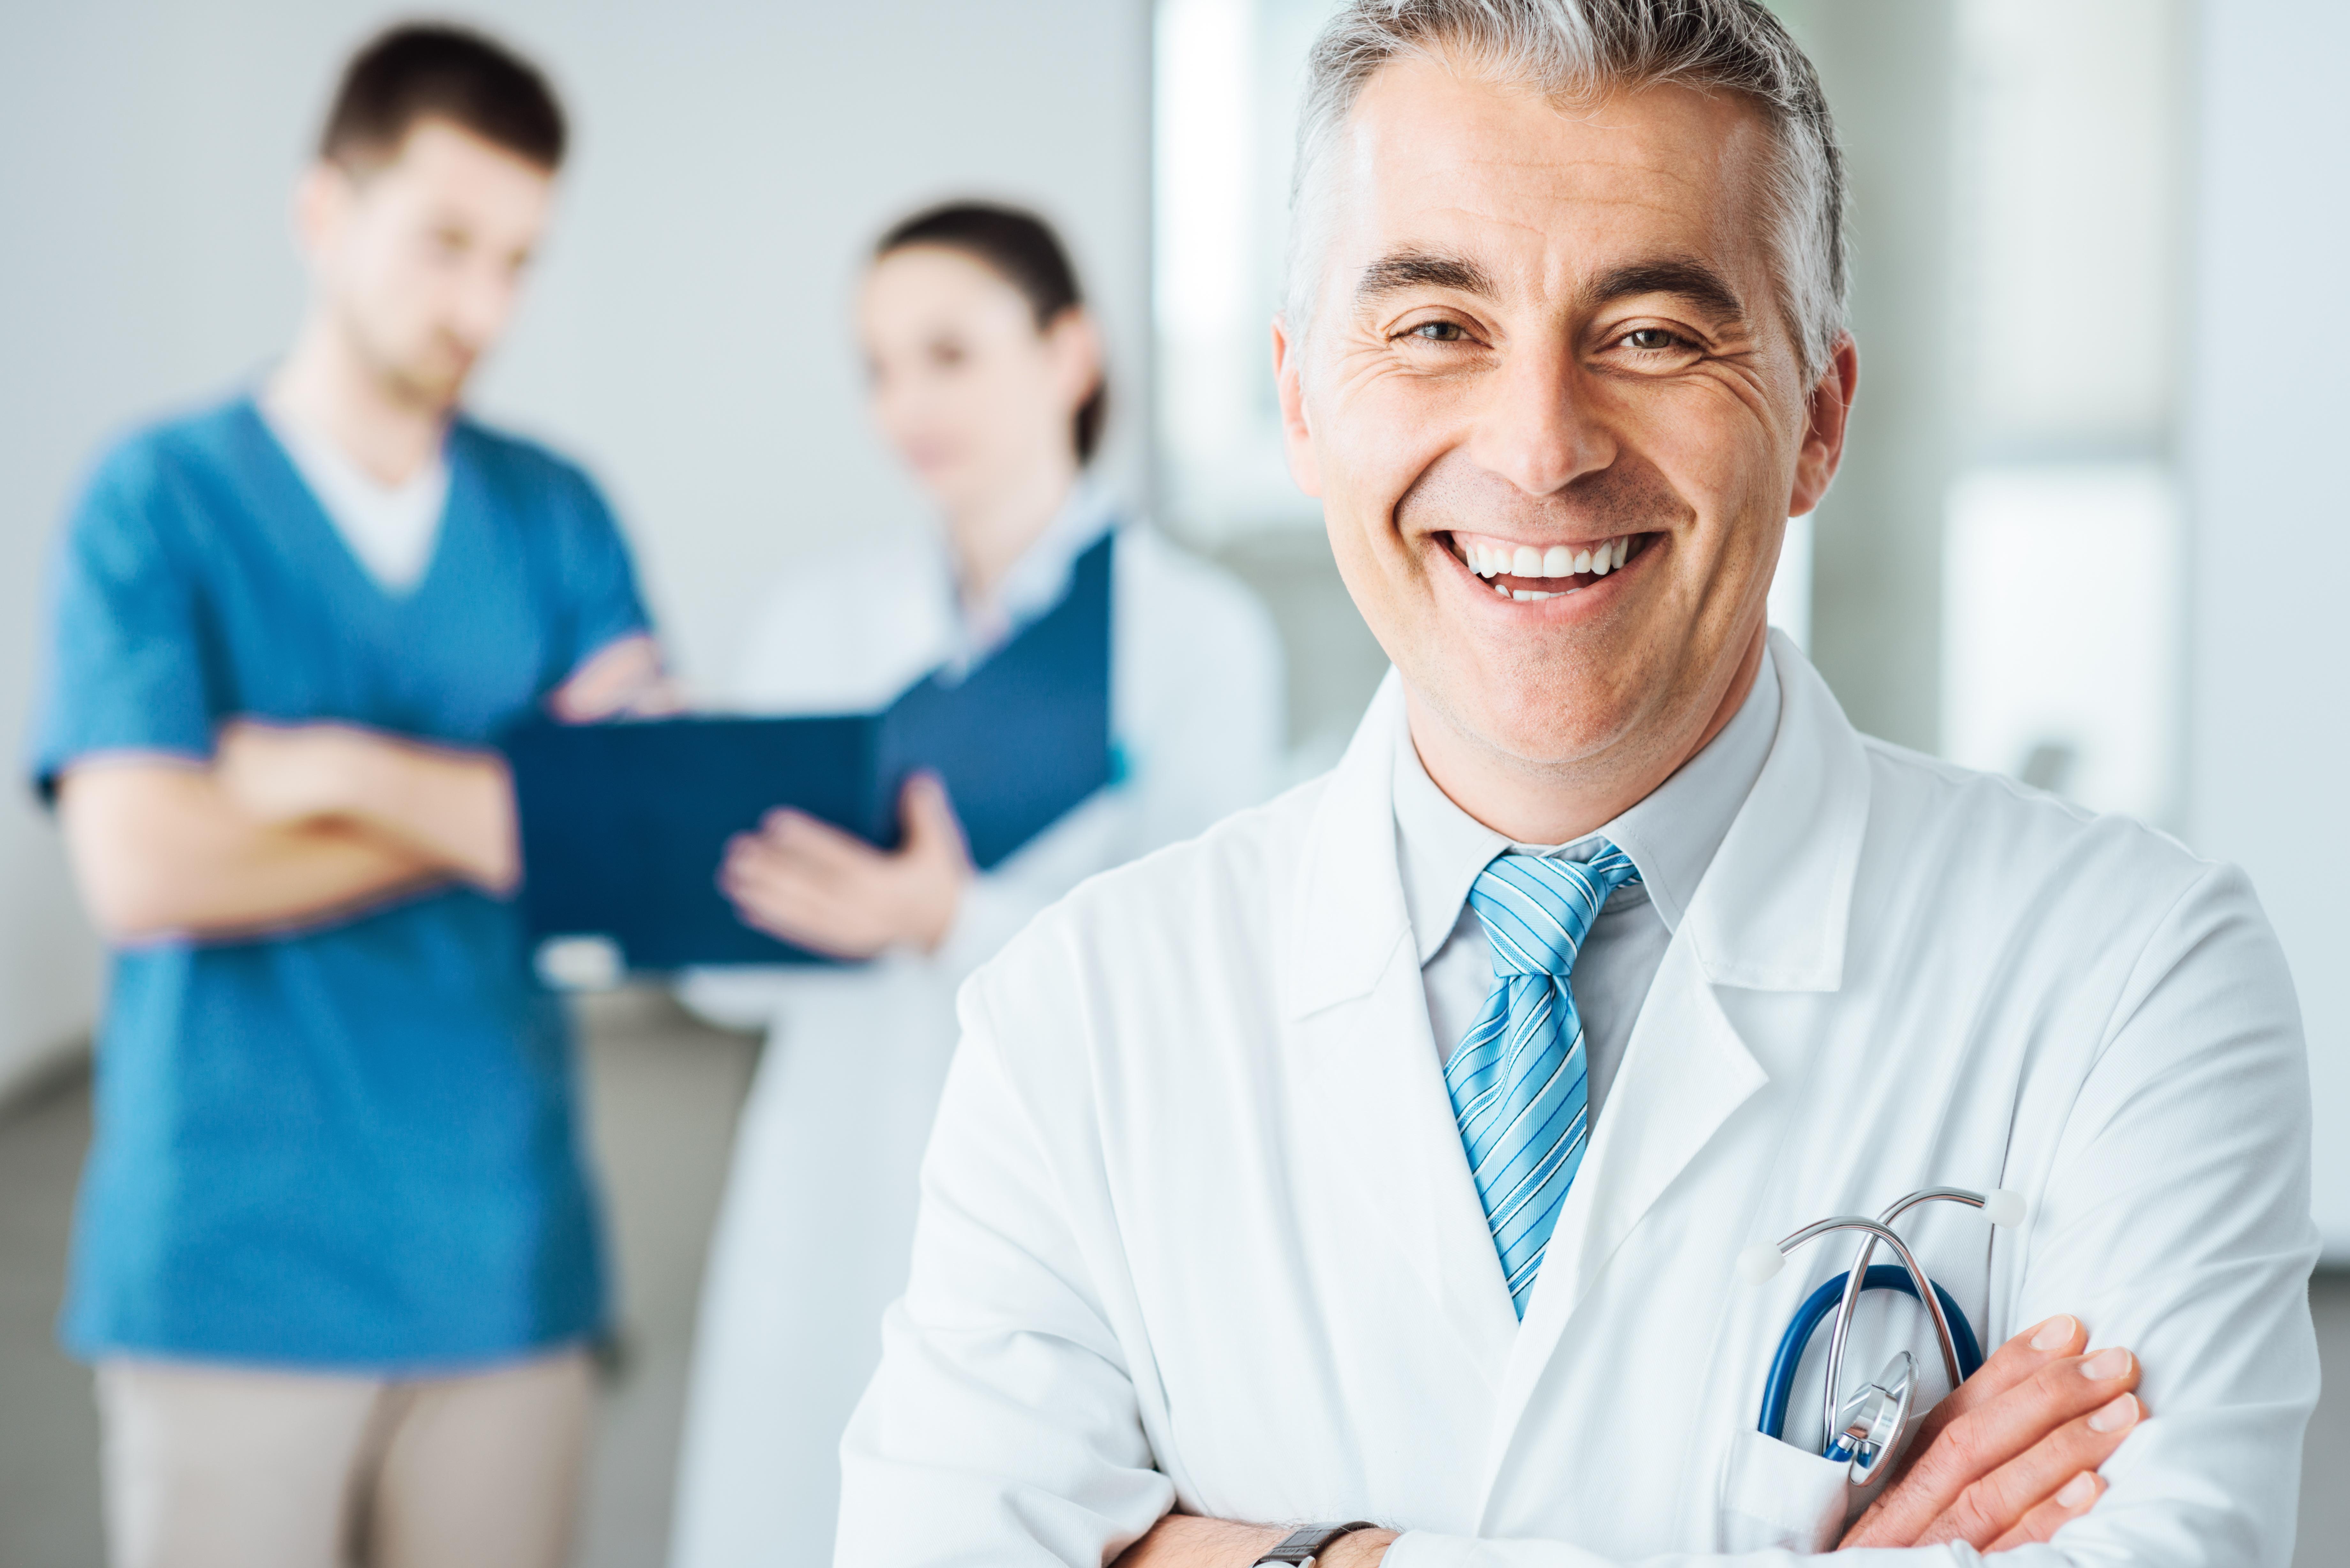 Happy doctor.jpg